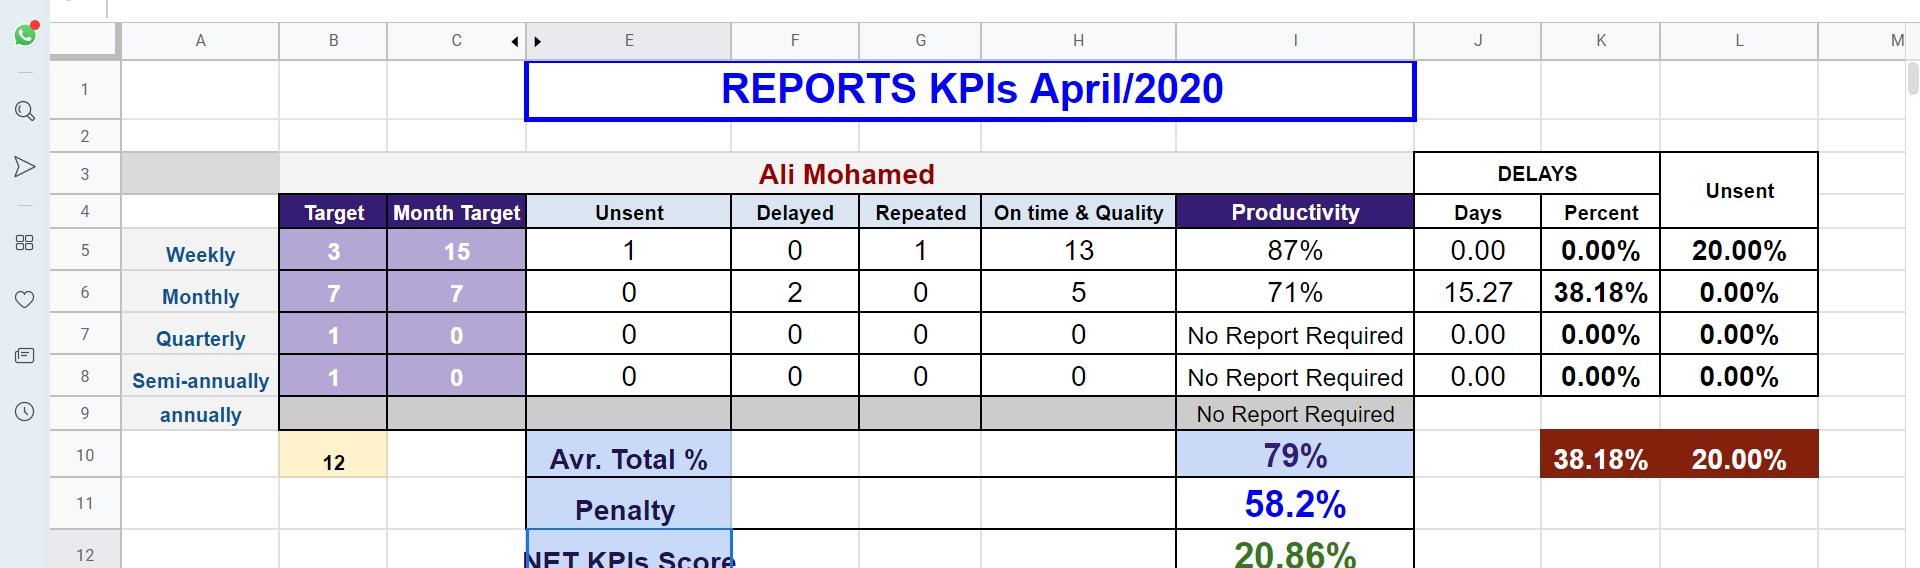 kpis system